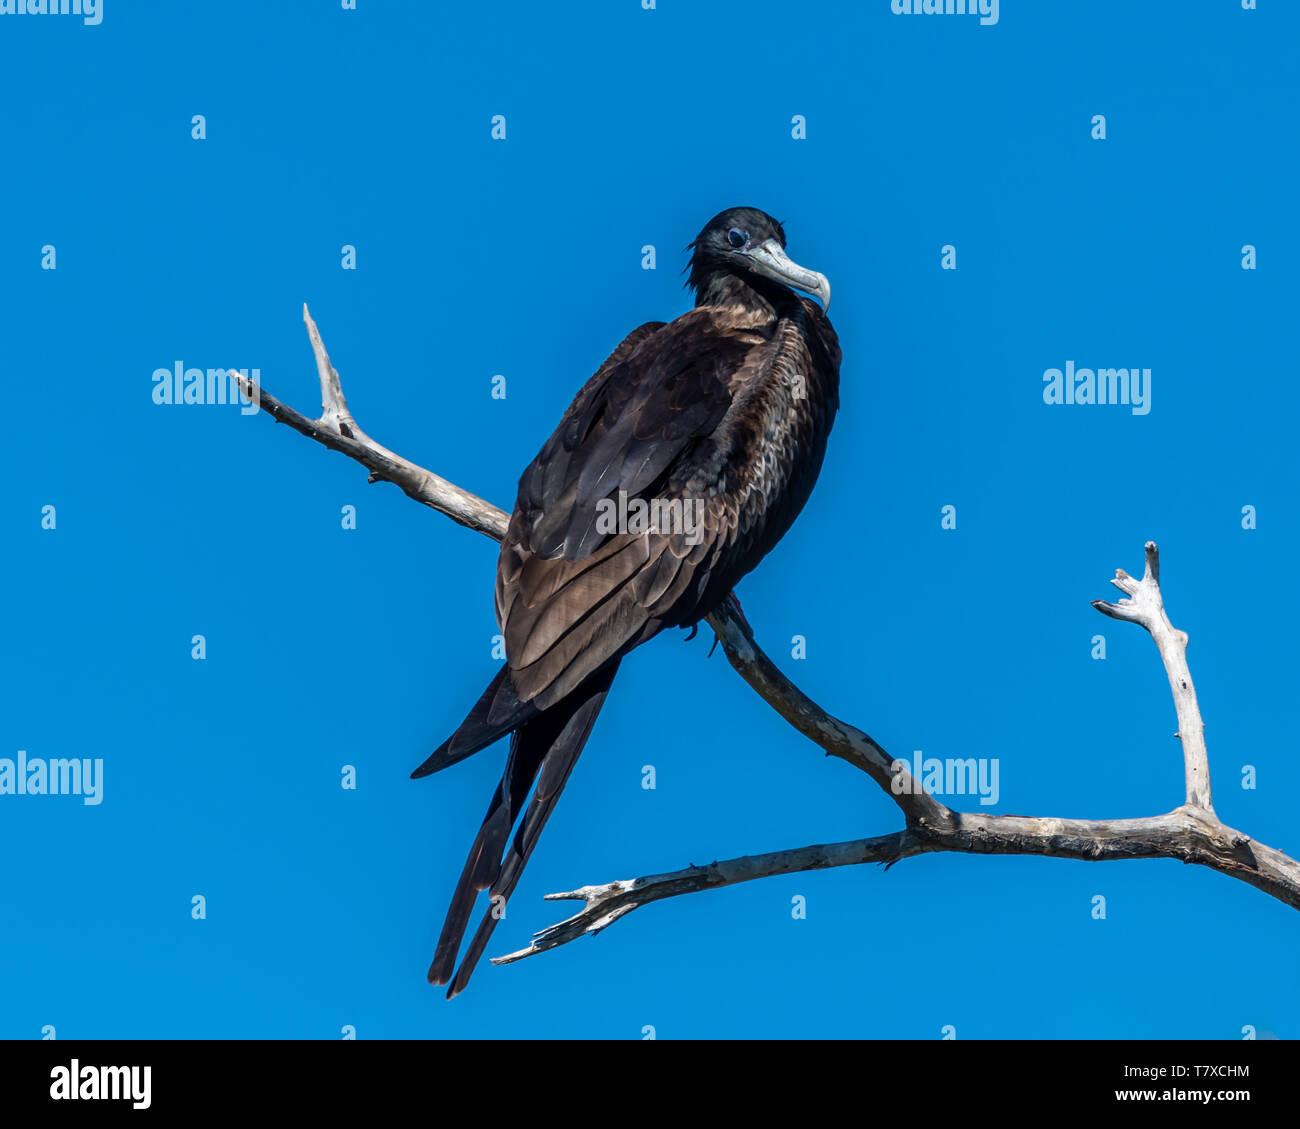 Adult male Magnificent frigatebird (fregata magnificens) perched on a dead branch in Baja California, Mexico. Stock Photo